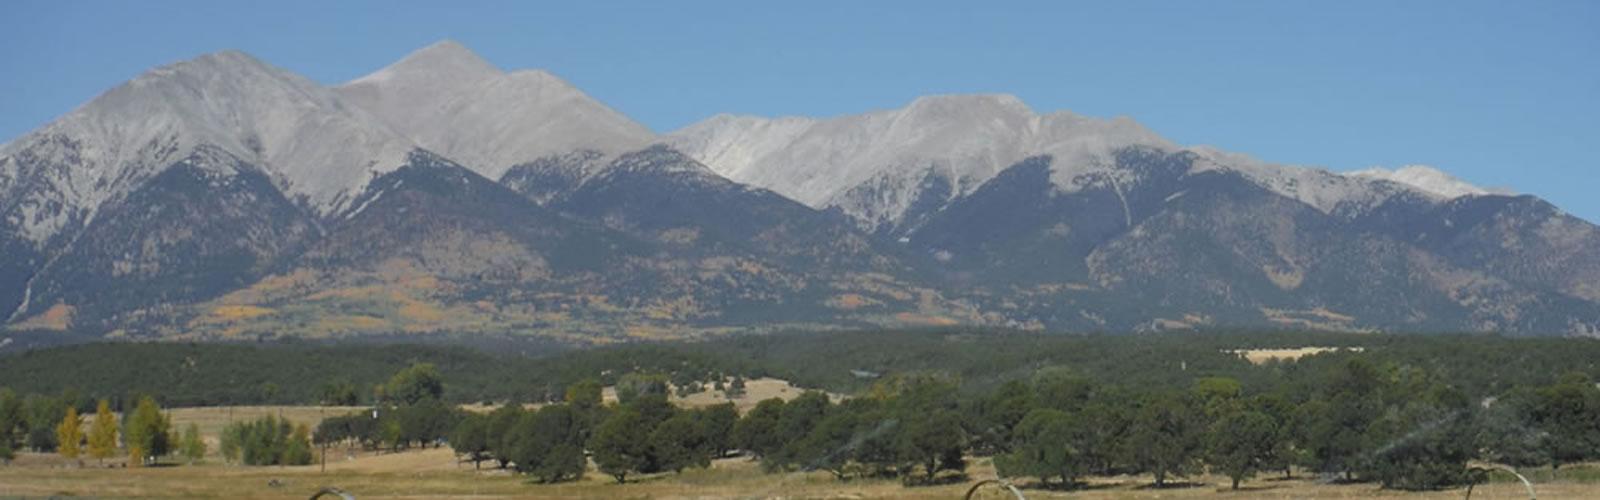 Mountains-Salida